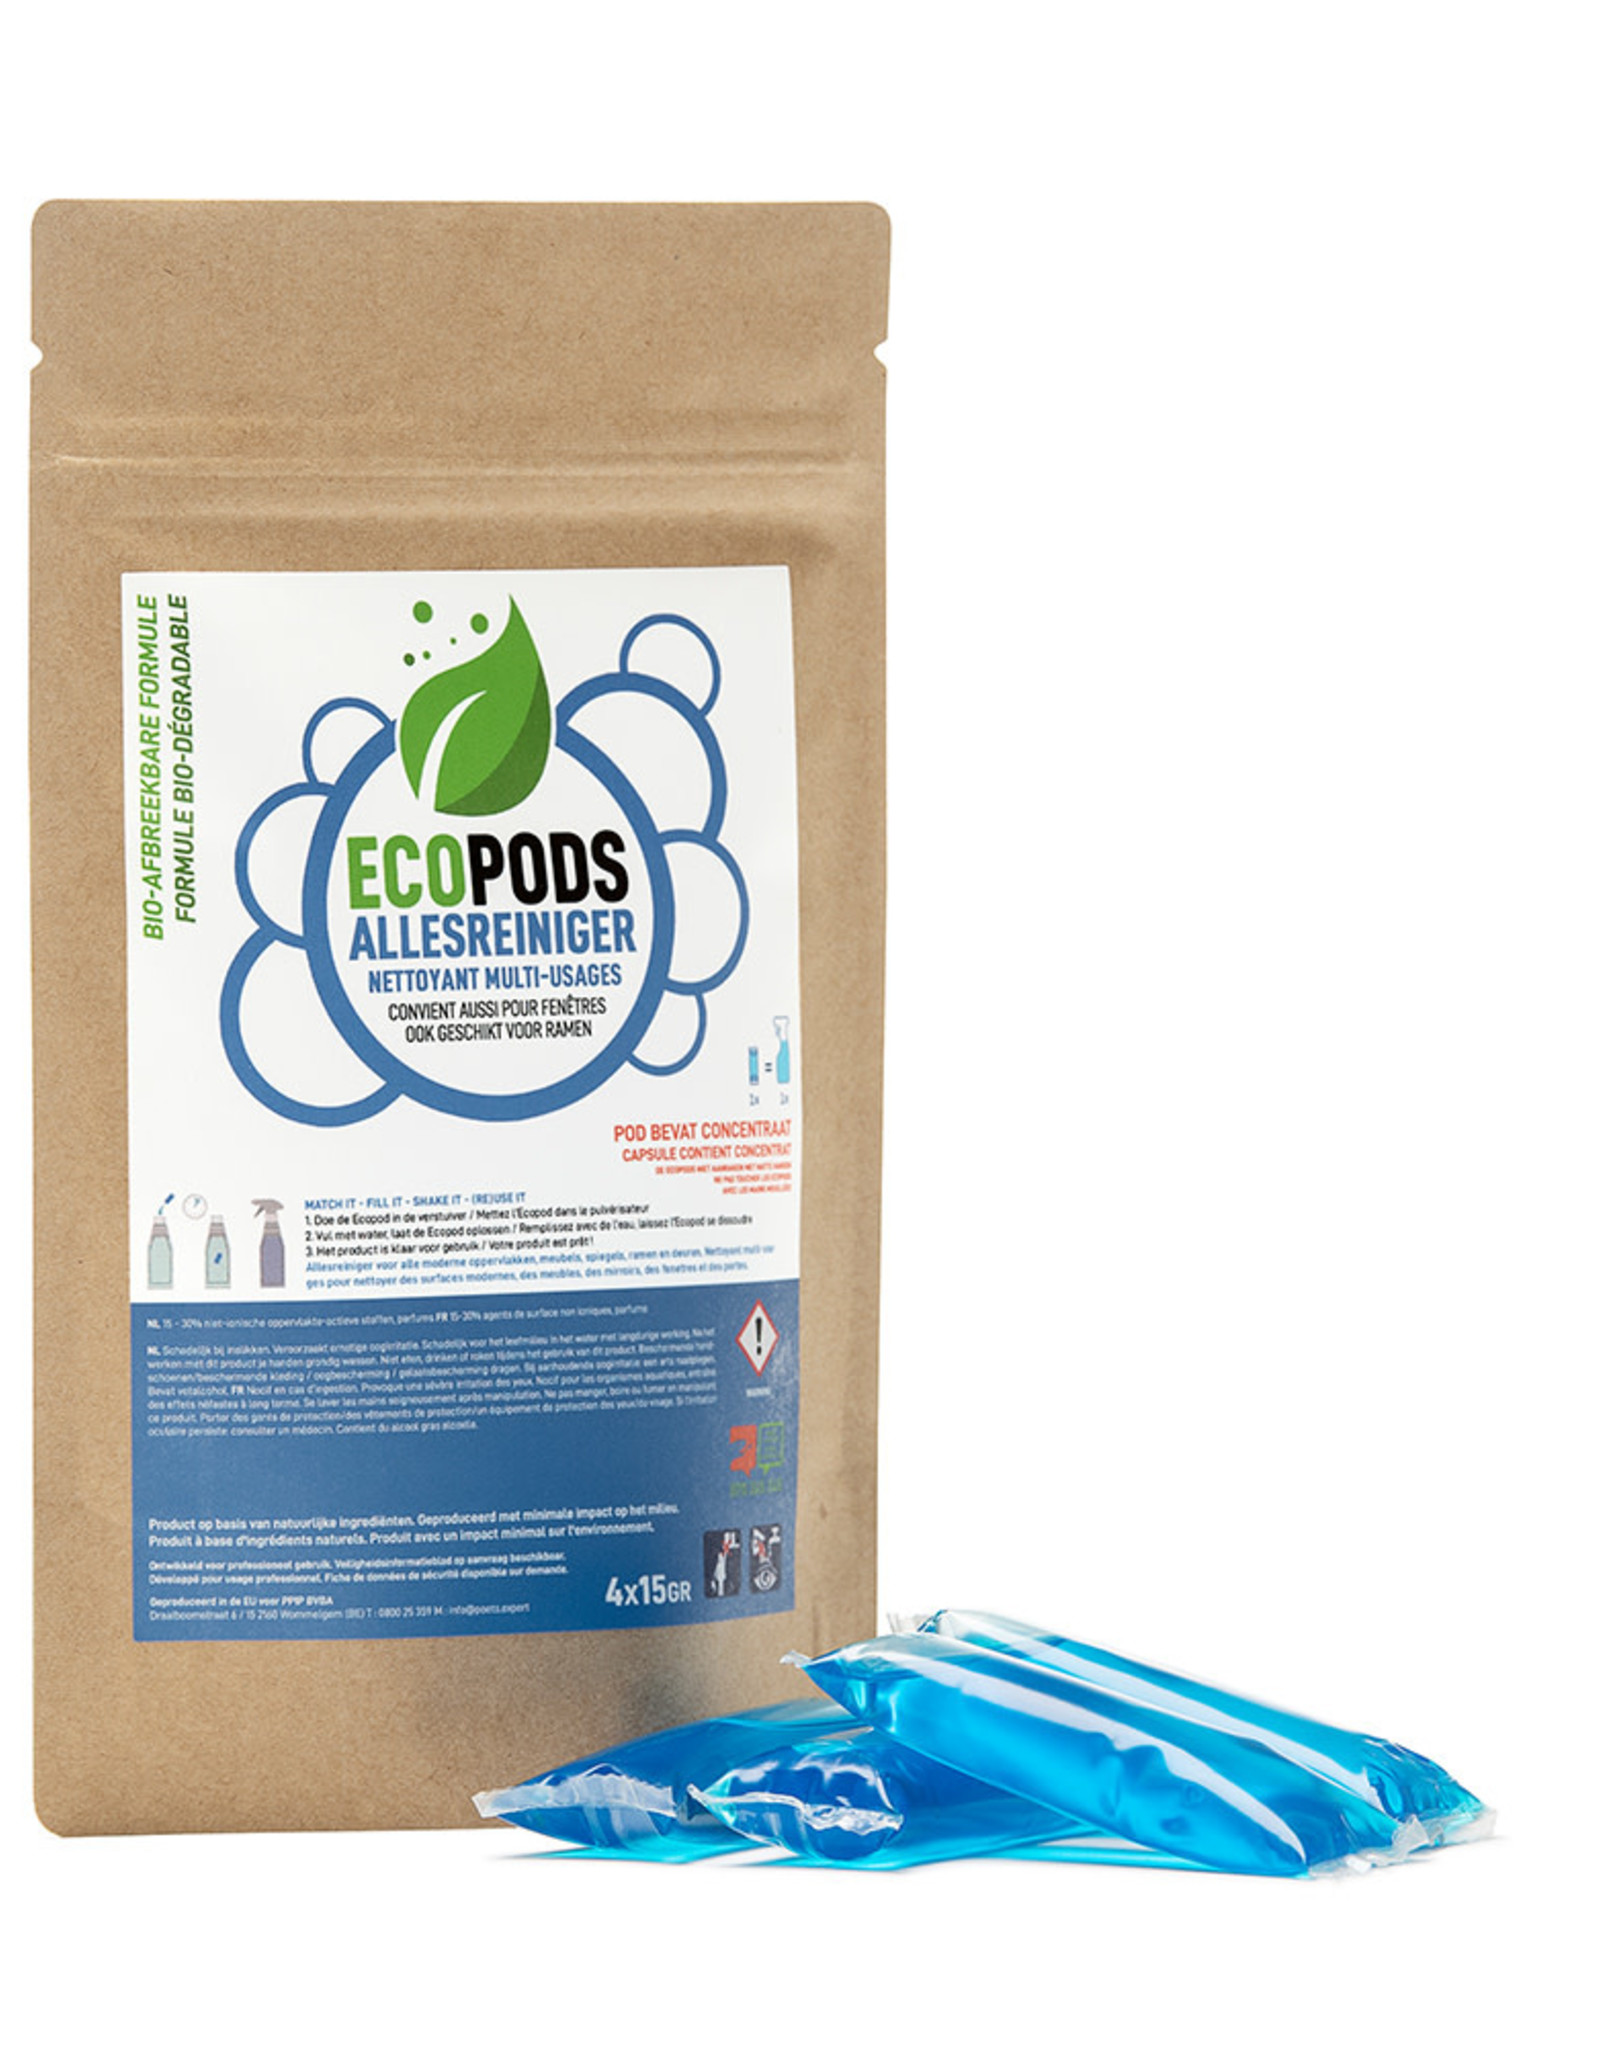 Ecopods Ecopods -  blauwe pods allesreiniger 1 stuk